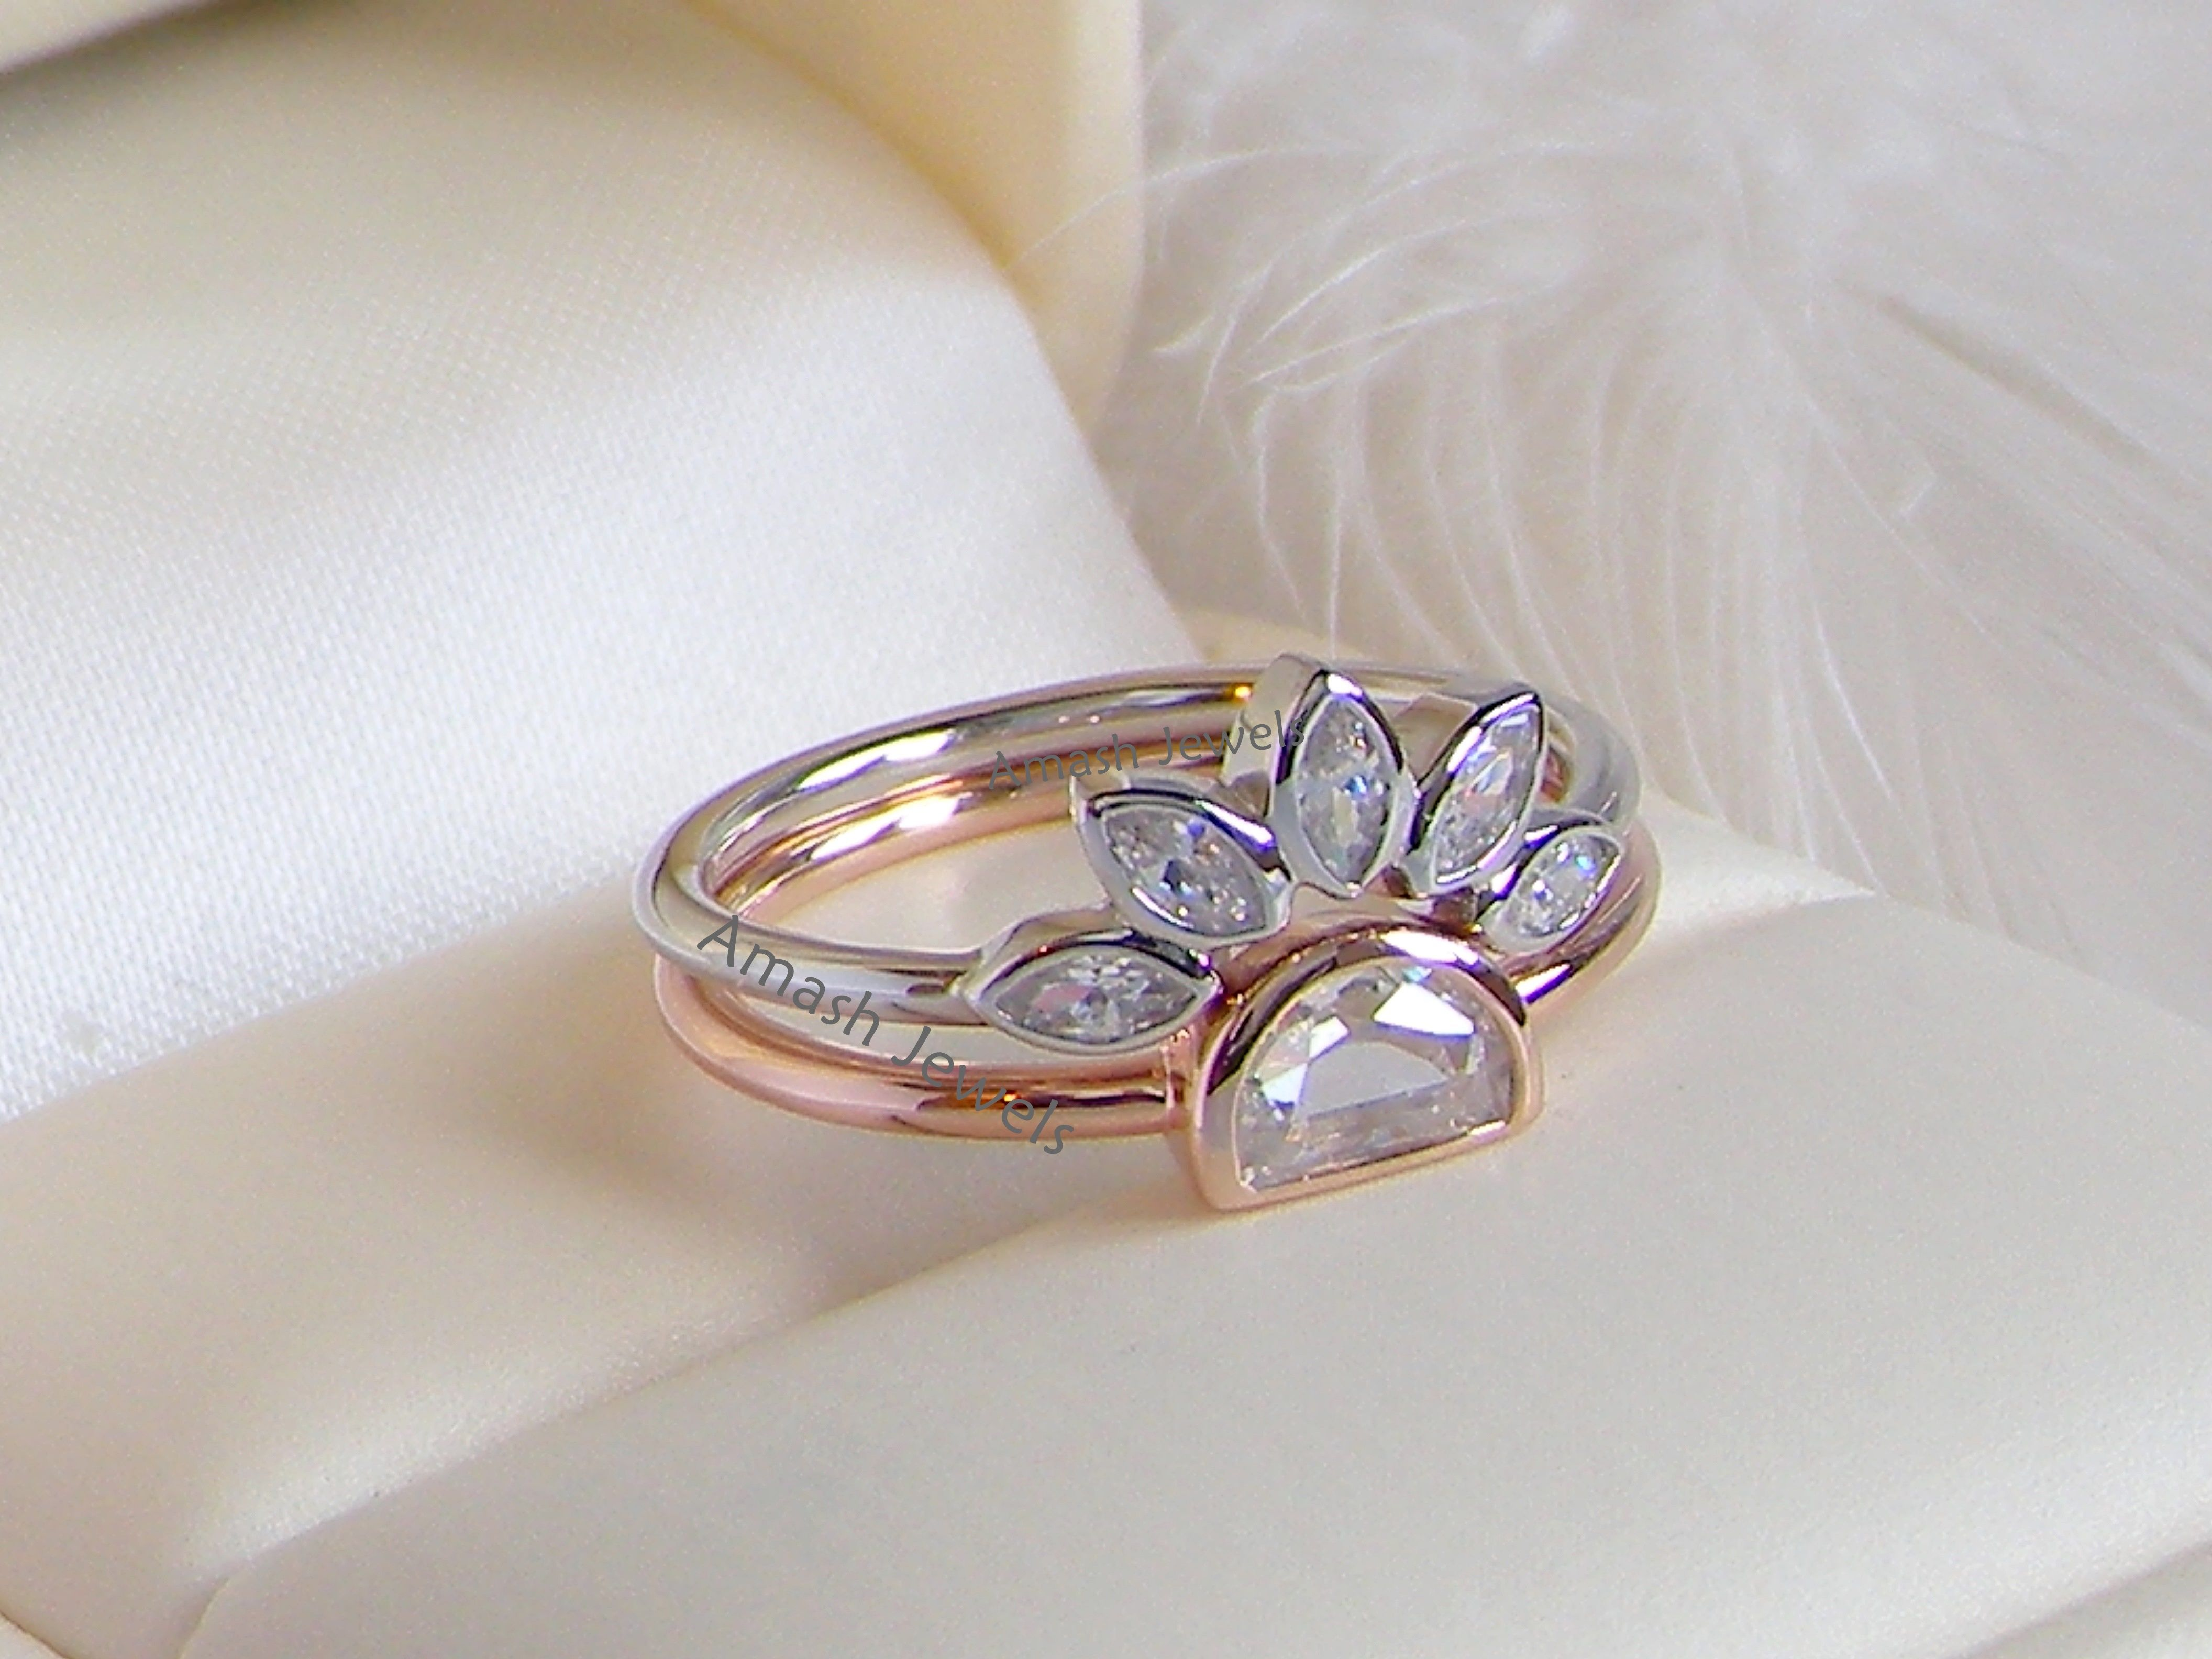 Price $39 Unusual rare Marquise Diamond Style rings set